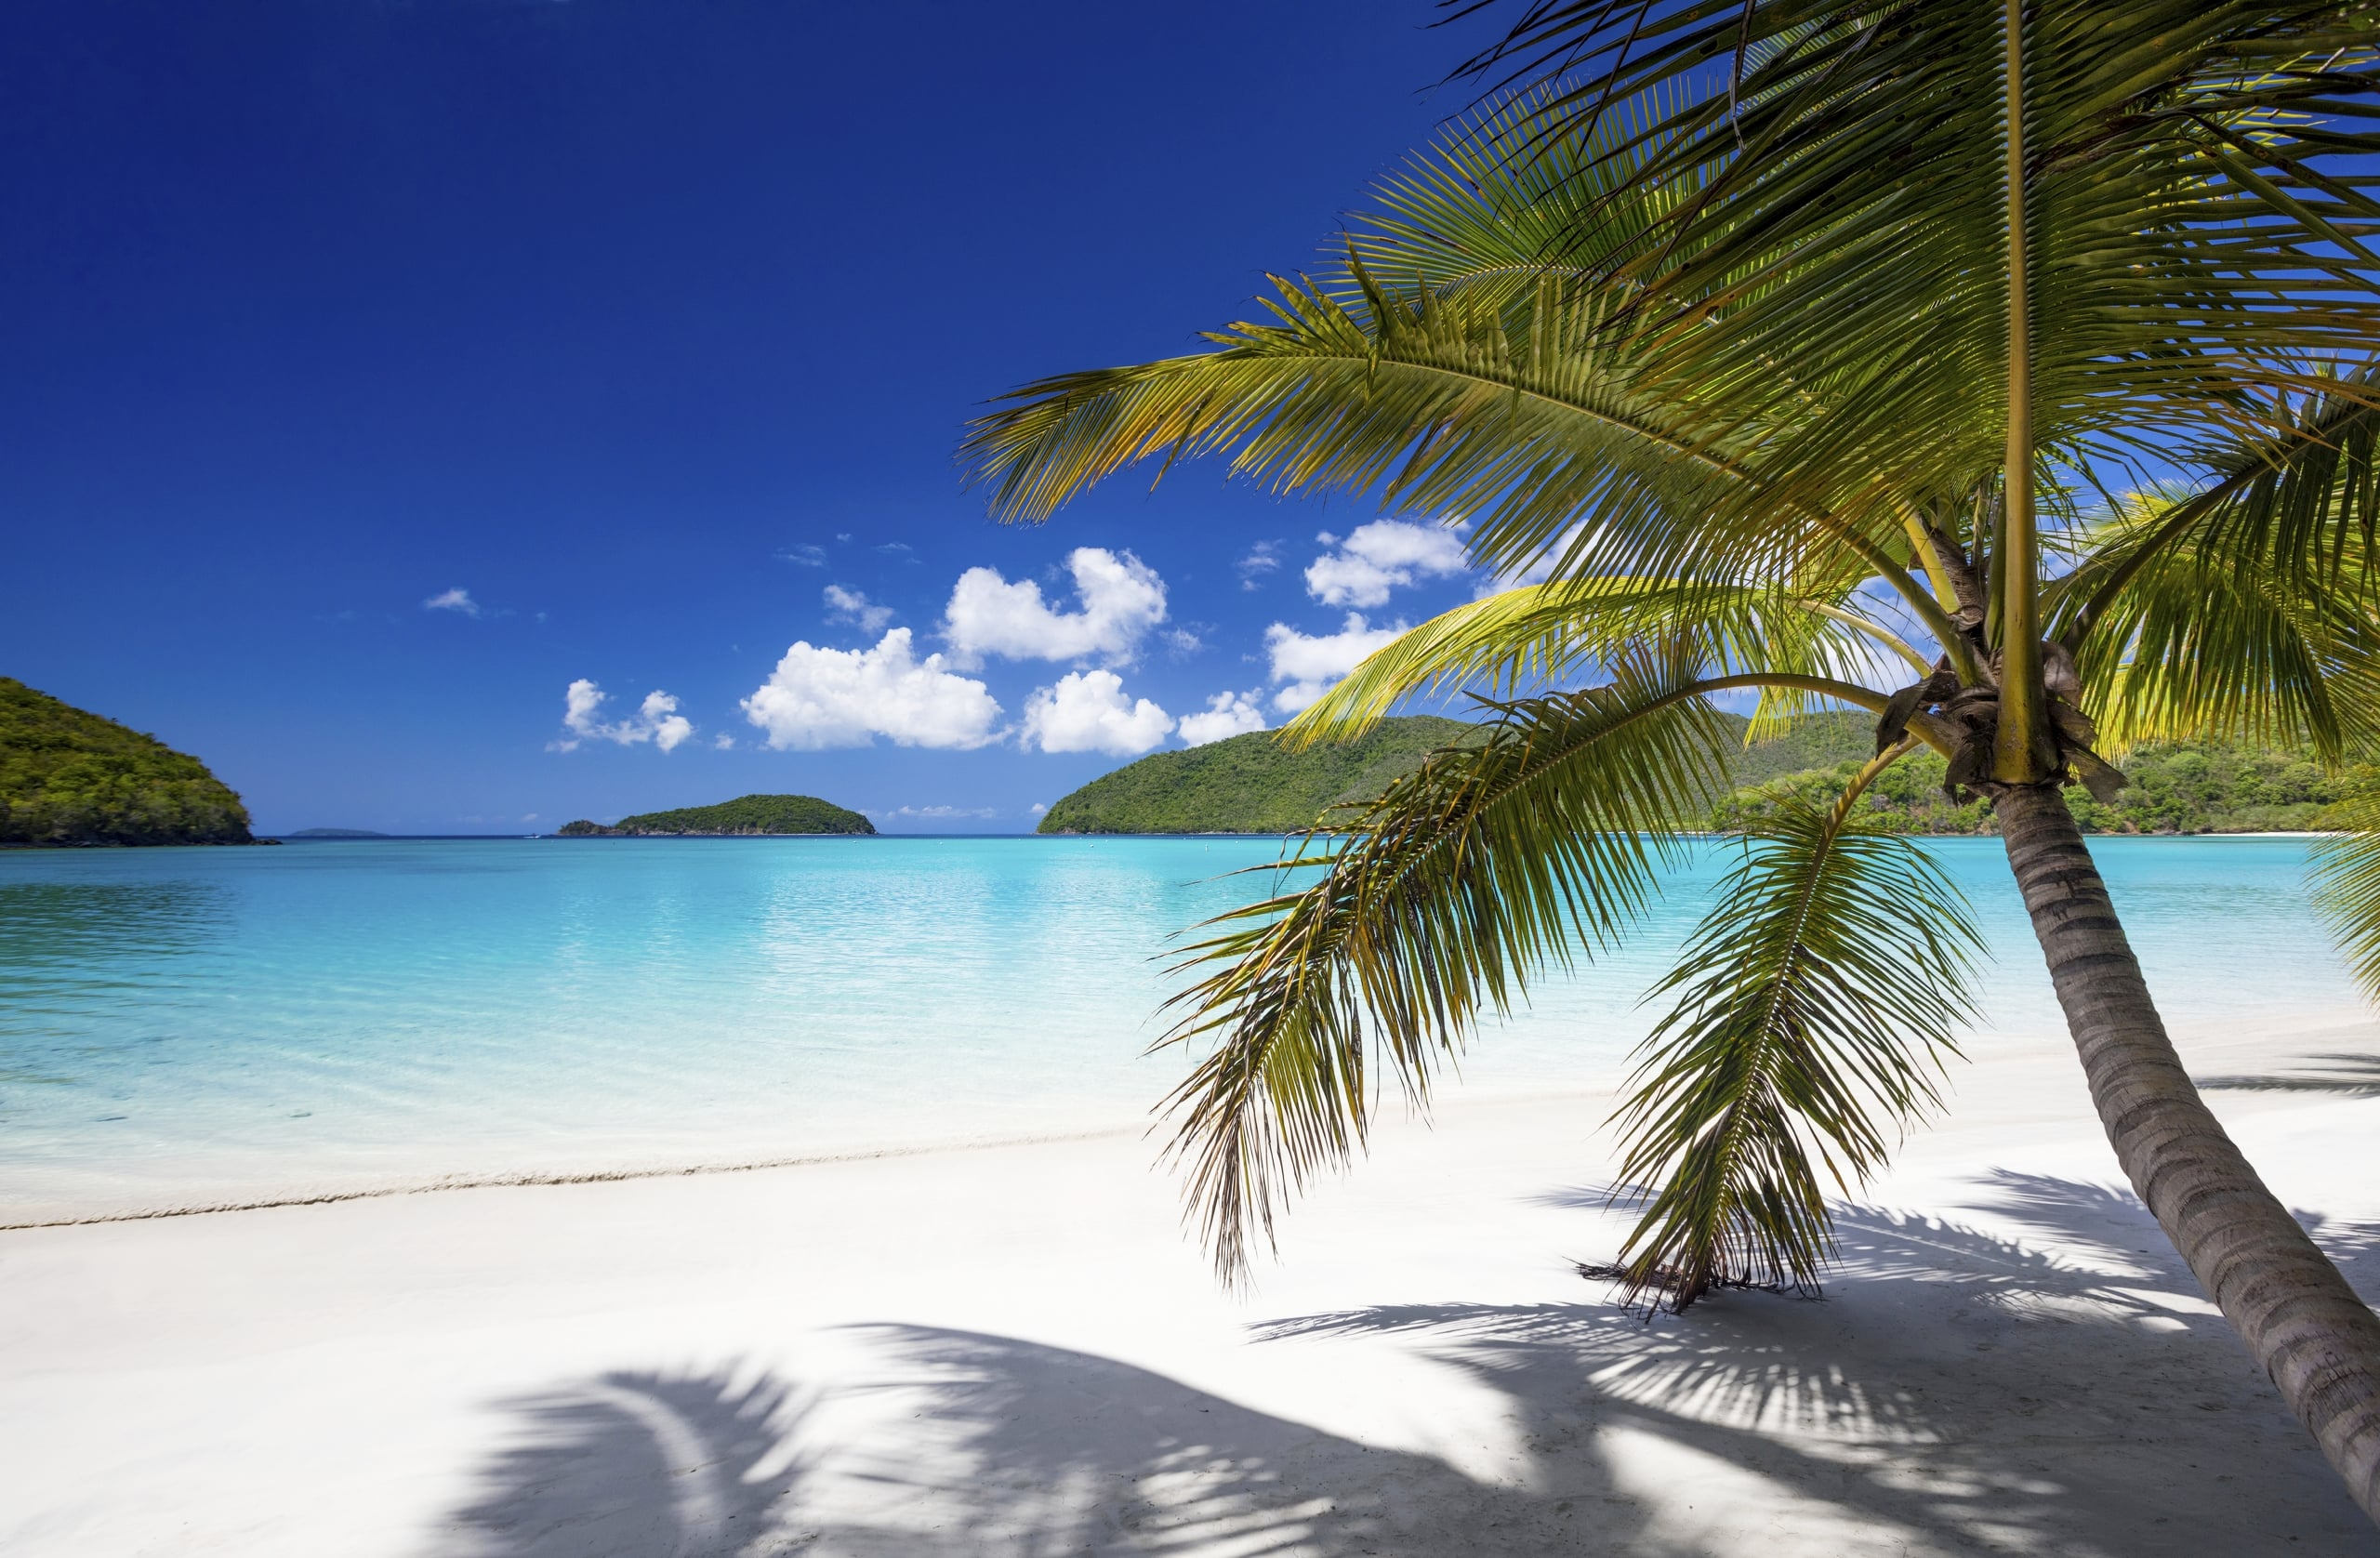 Wakacje all inclusive na Karaibach